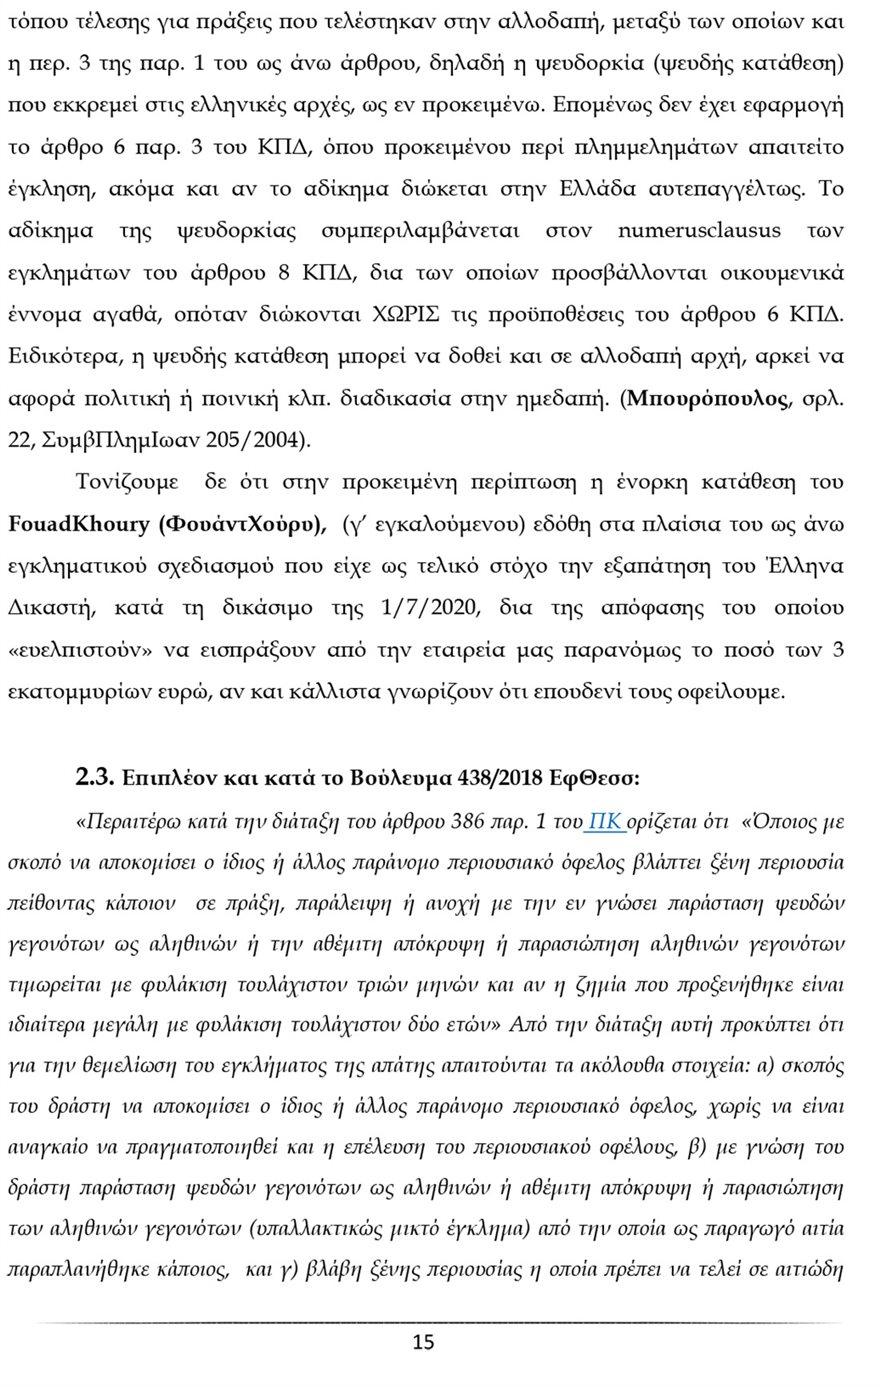 ypomnima-15